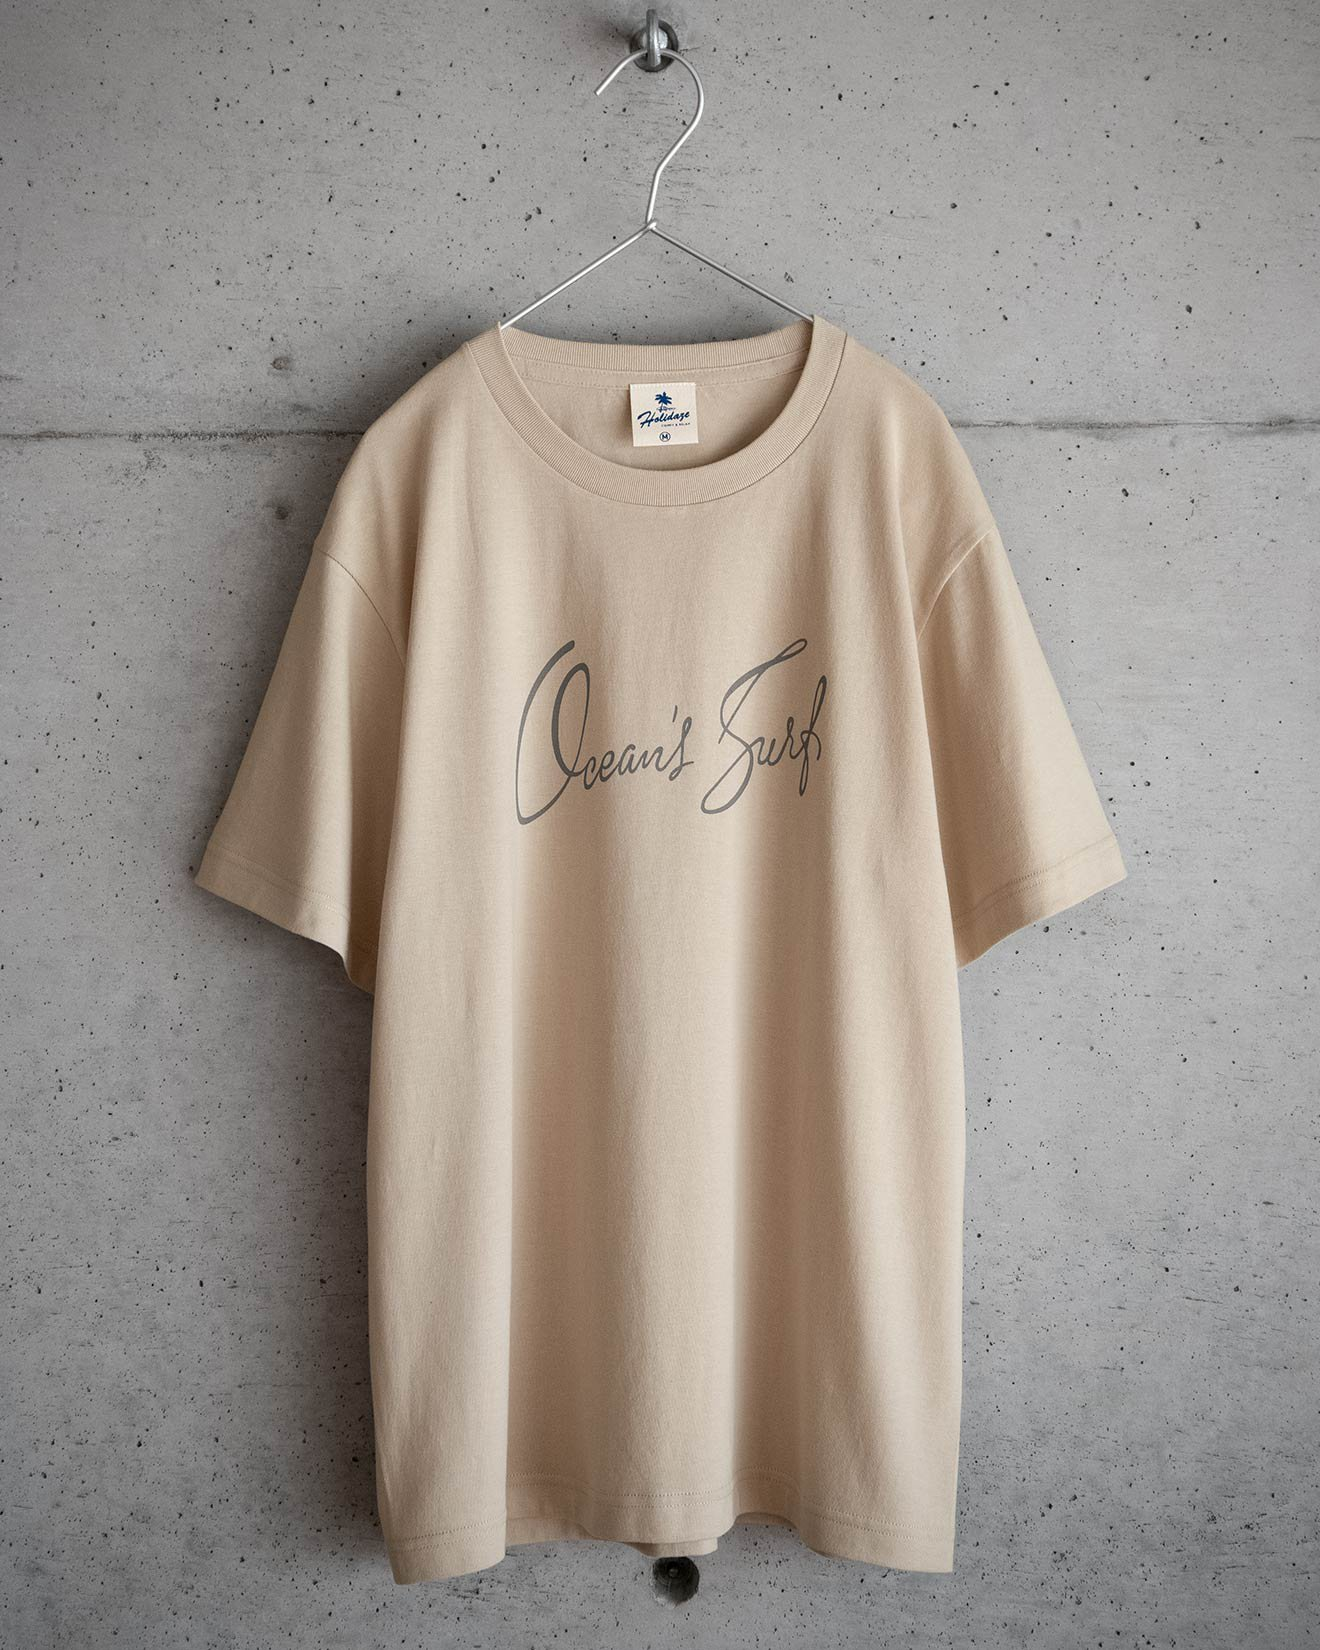 OCEAN'S SURF Tシャツ